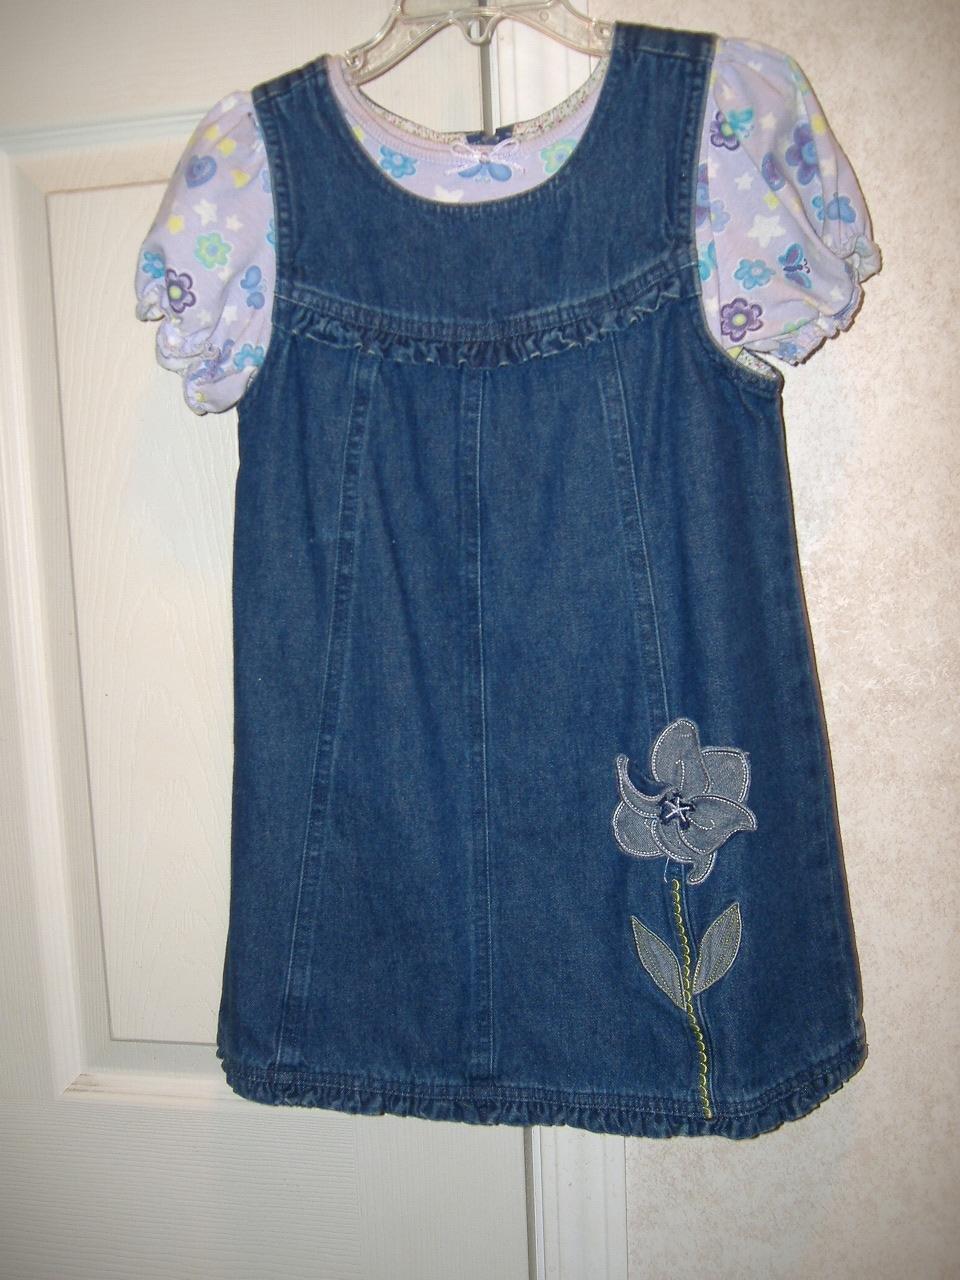 Fade Glory Girl's Denim Dress  Size 5T